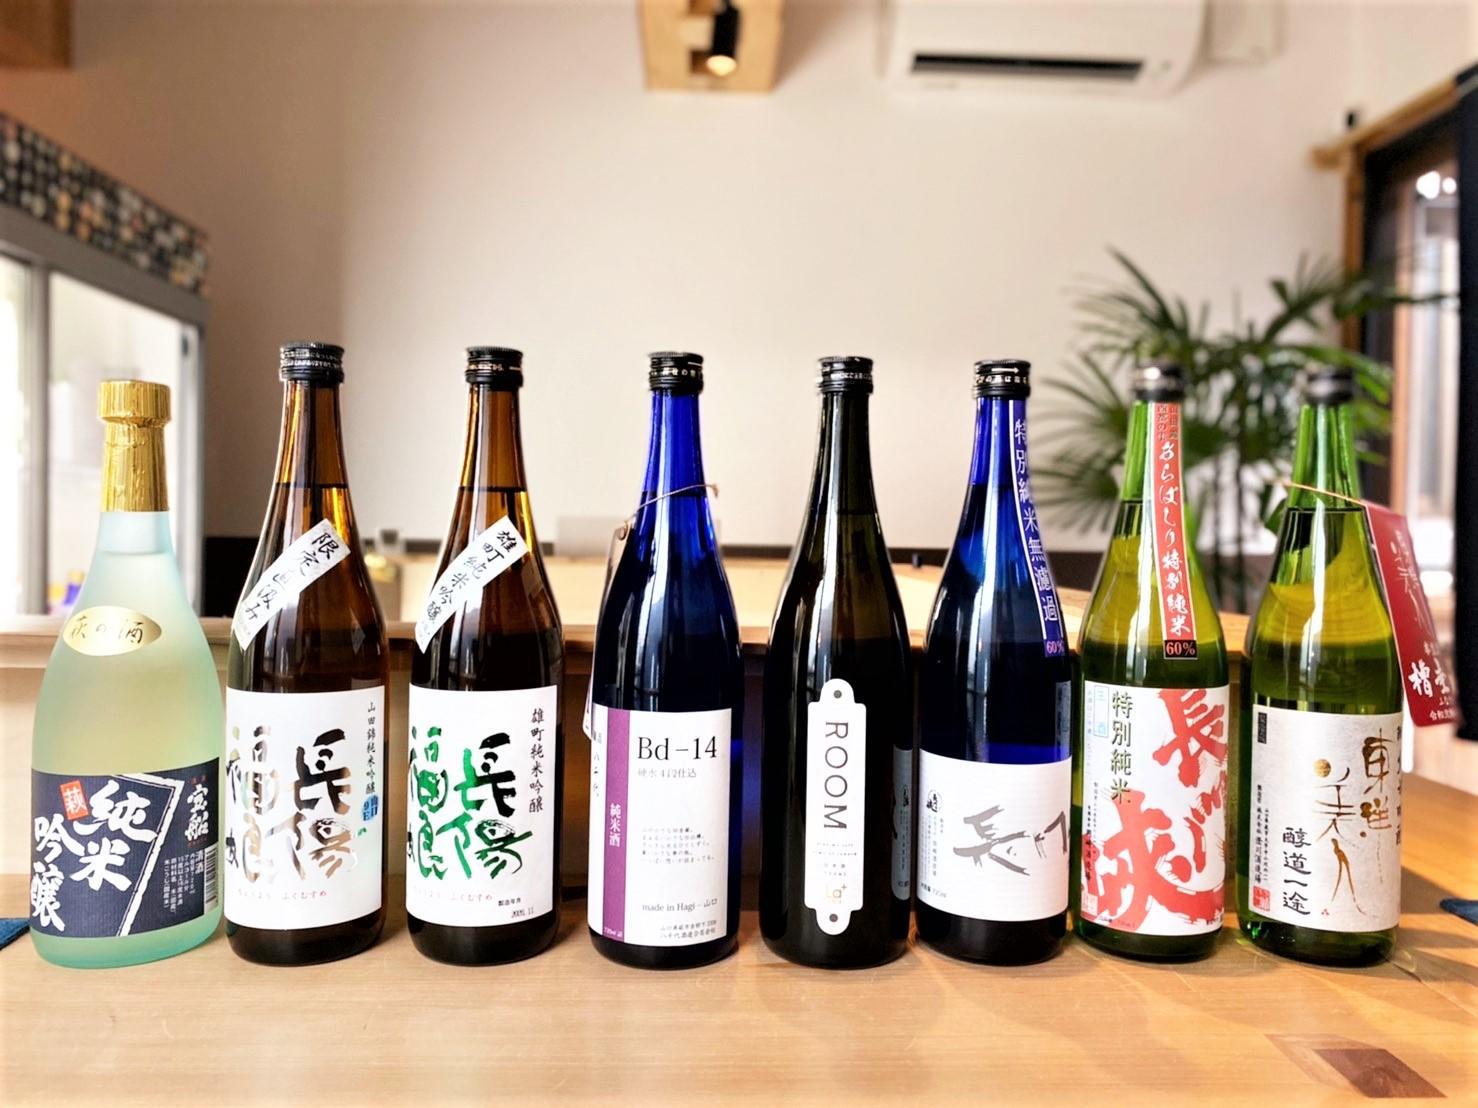 萩酒会 in kamakura